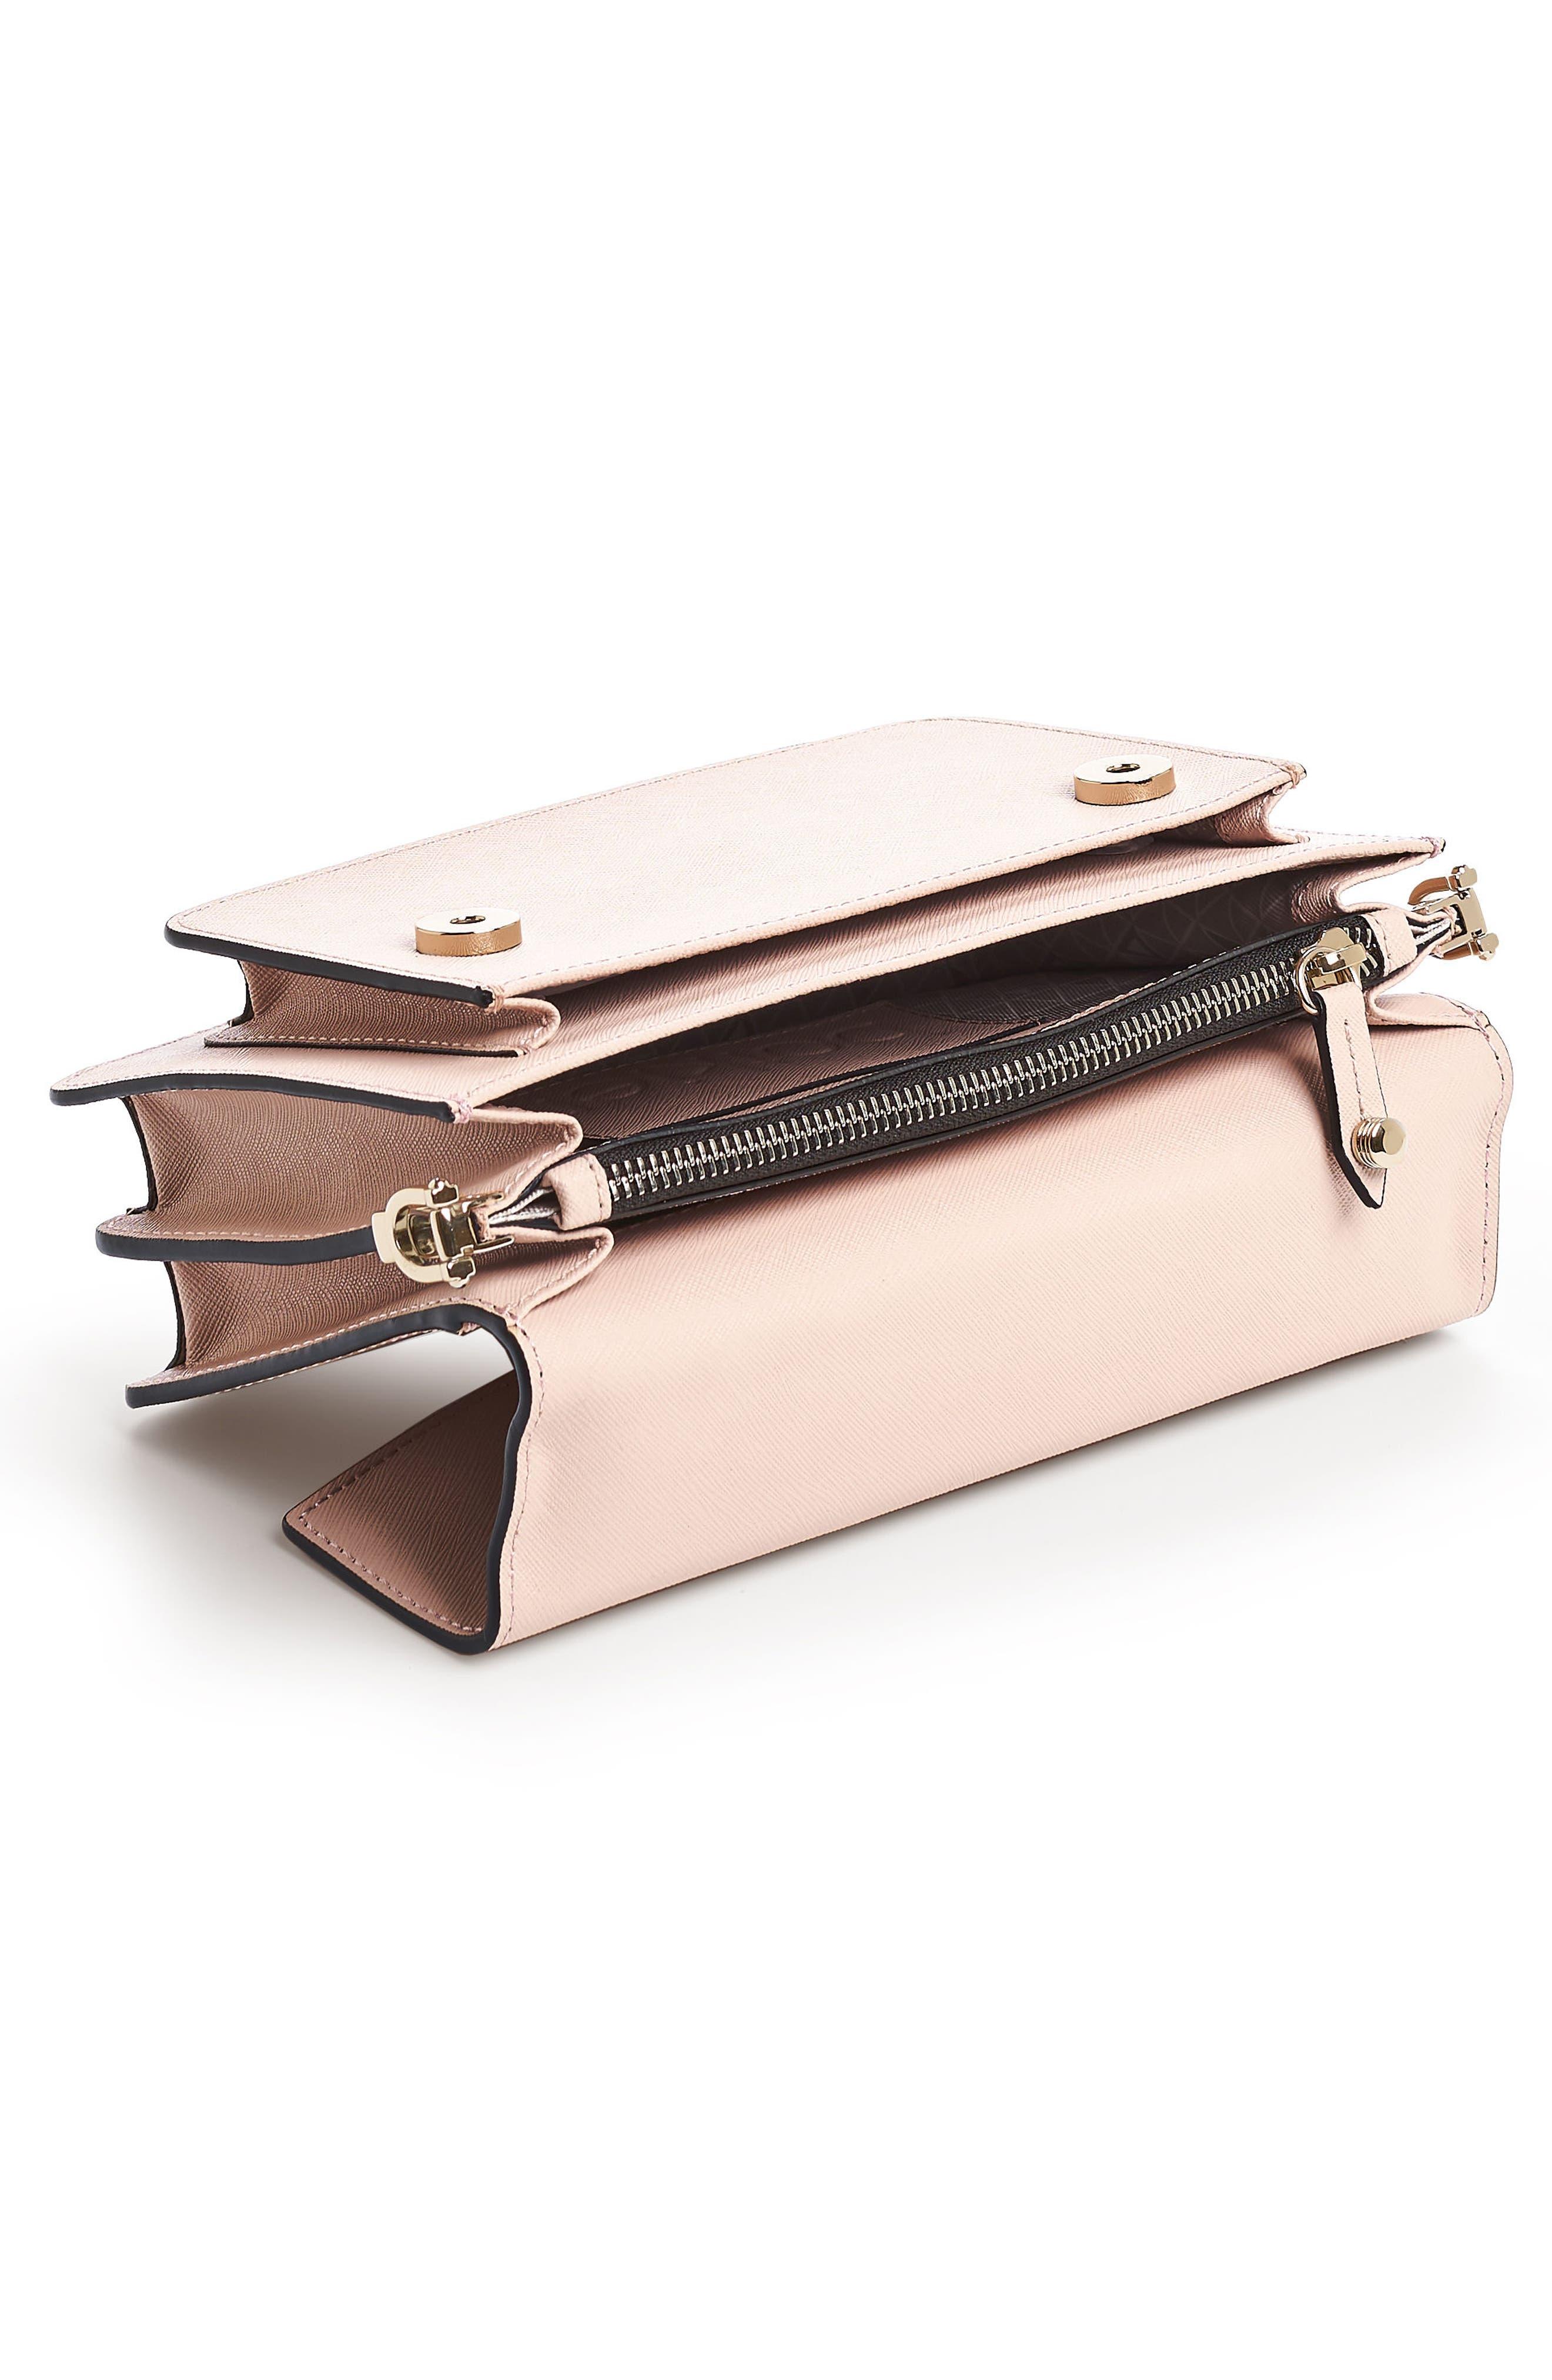 Cobble Hill Leather Crossbody Bag,                             Alternate thumbnail 127, color,